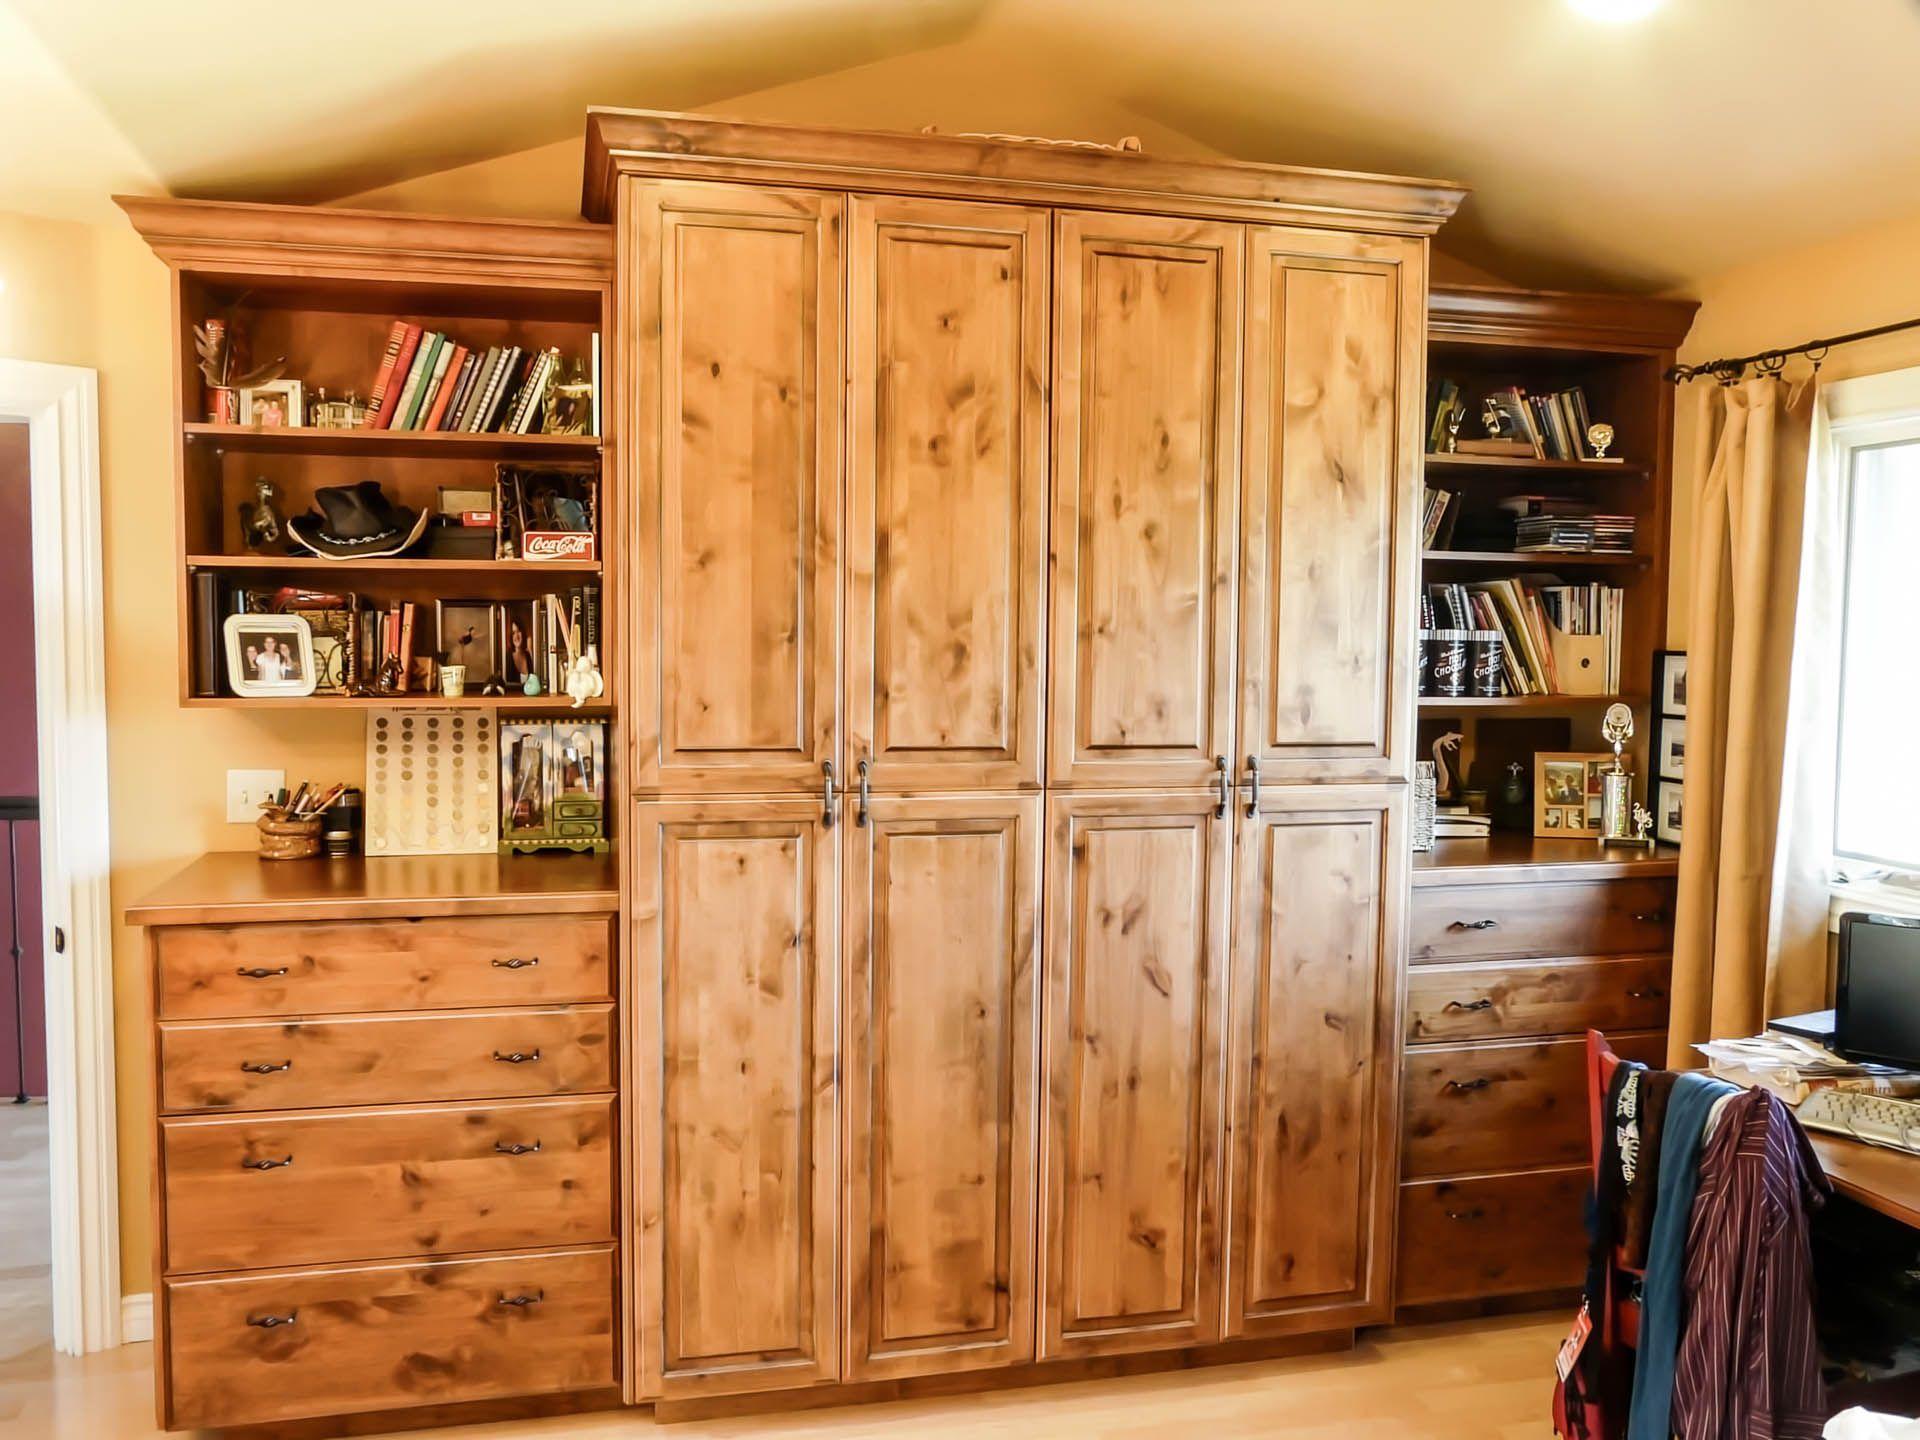 Bedroom Custom Wardrobe Cabinets. Project Design U0026 Remodeling By Danilo  Nesovic, Designer · Builder